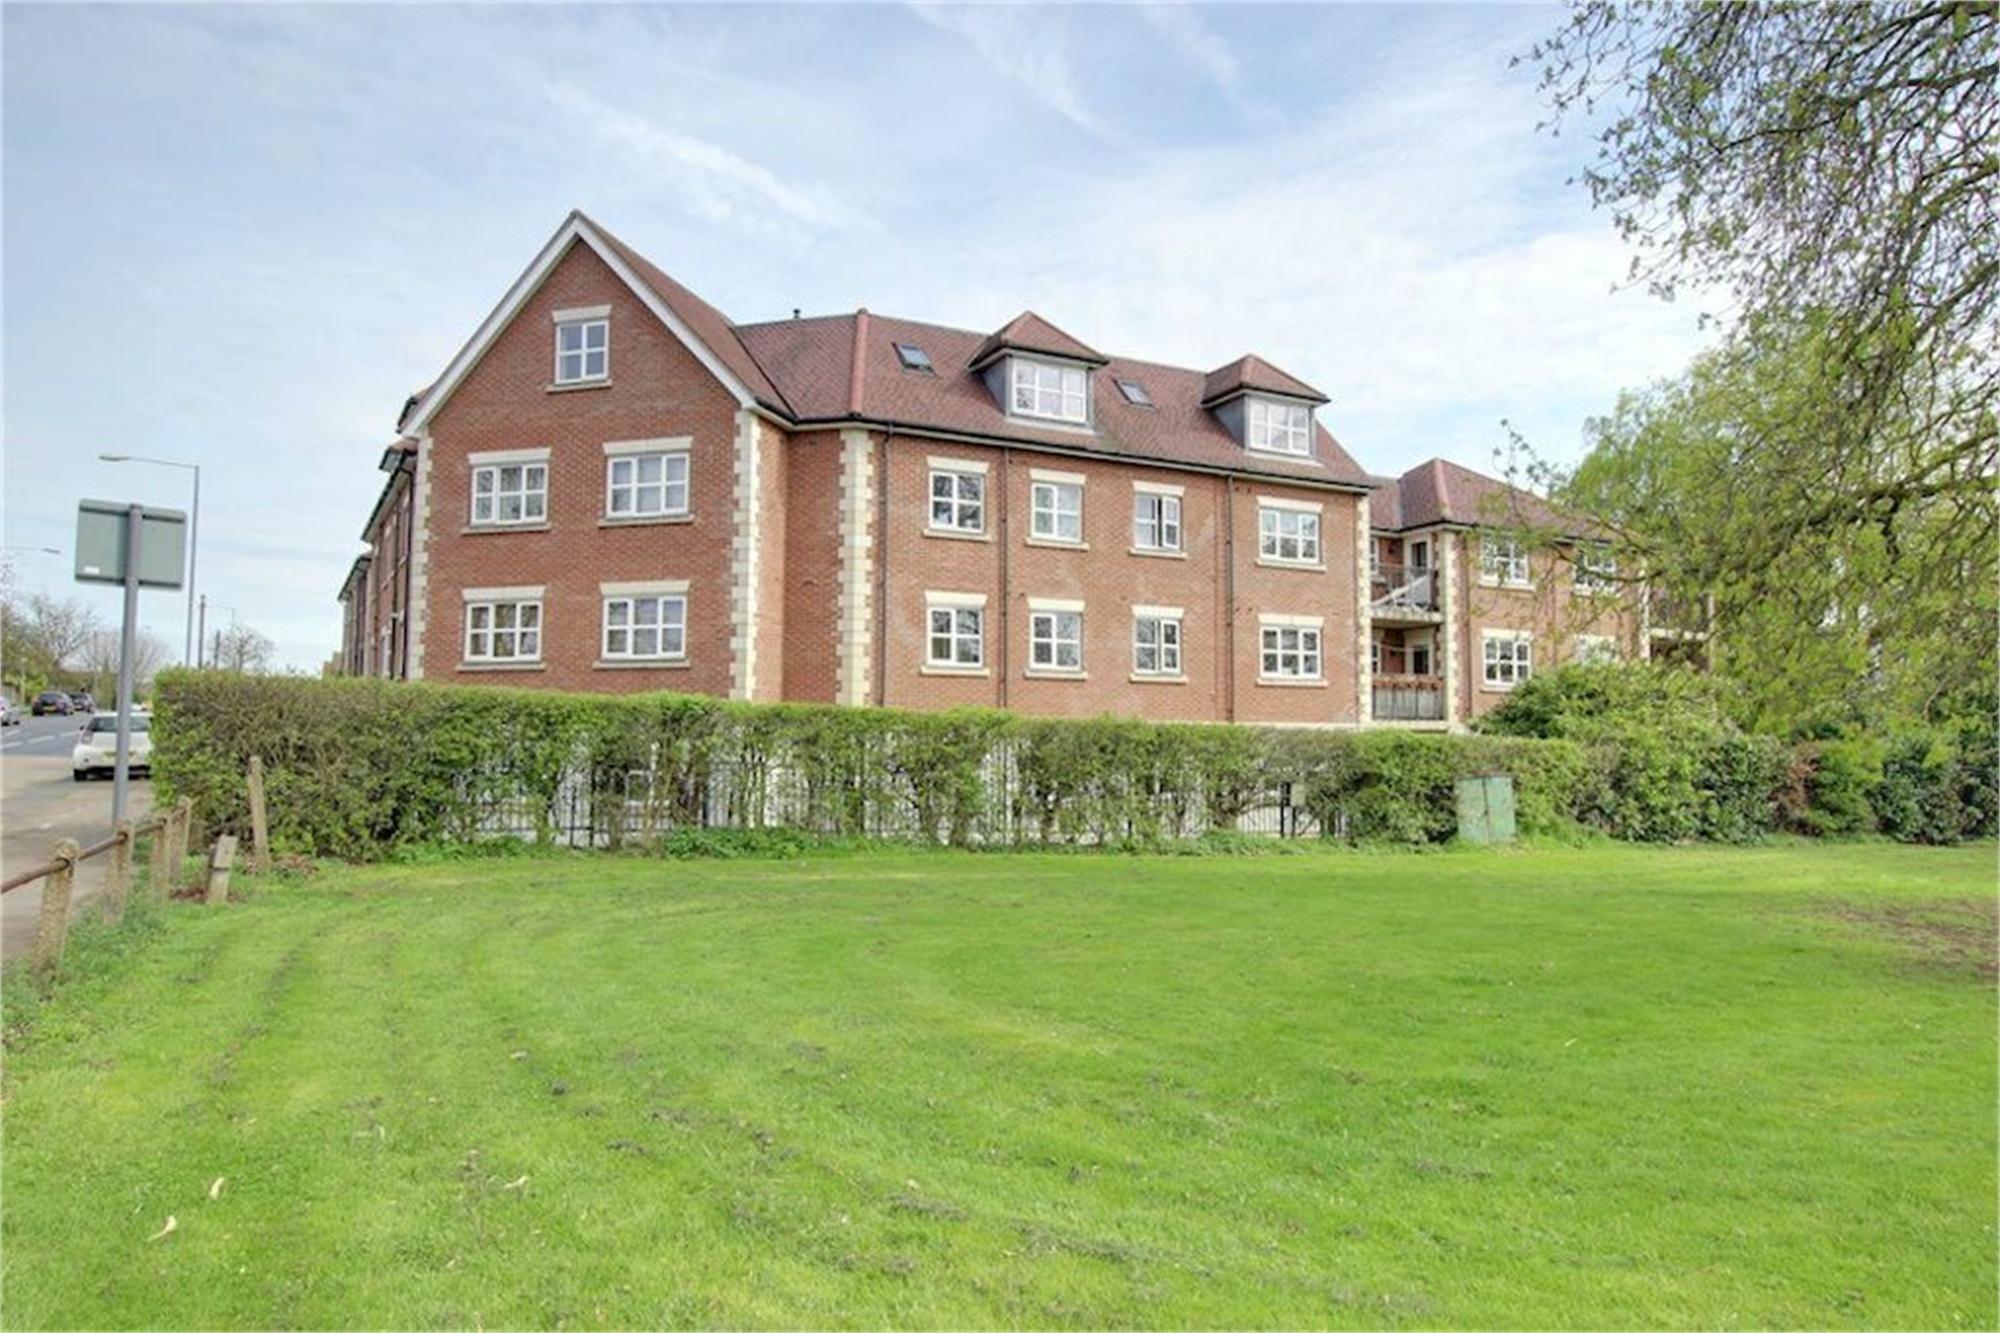 Hubbard Court, Valley Hill, Loughton, Essex